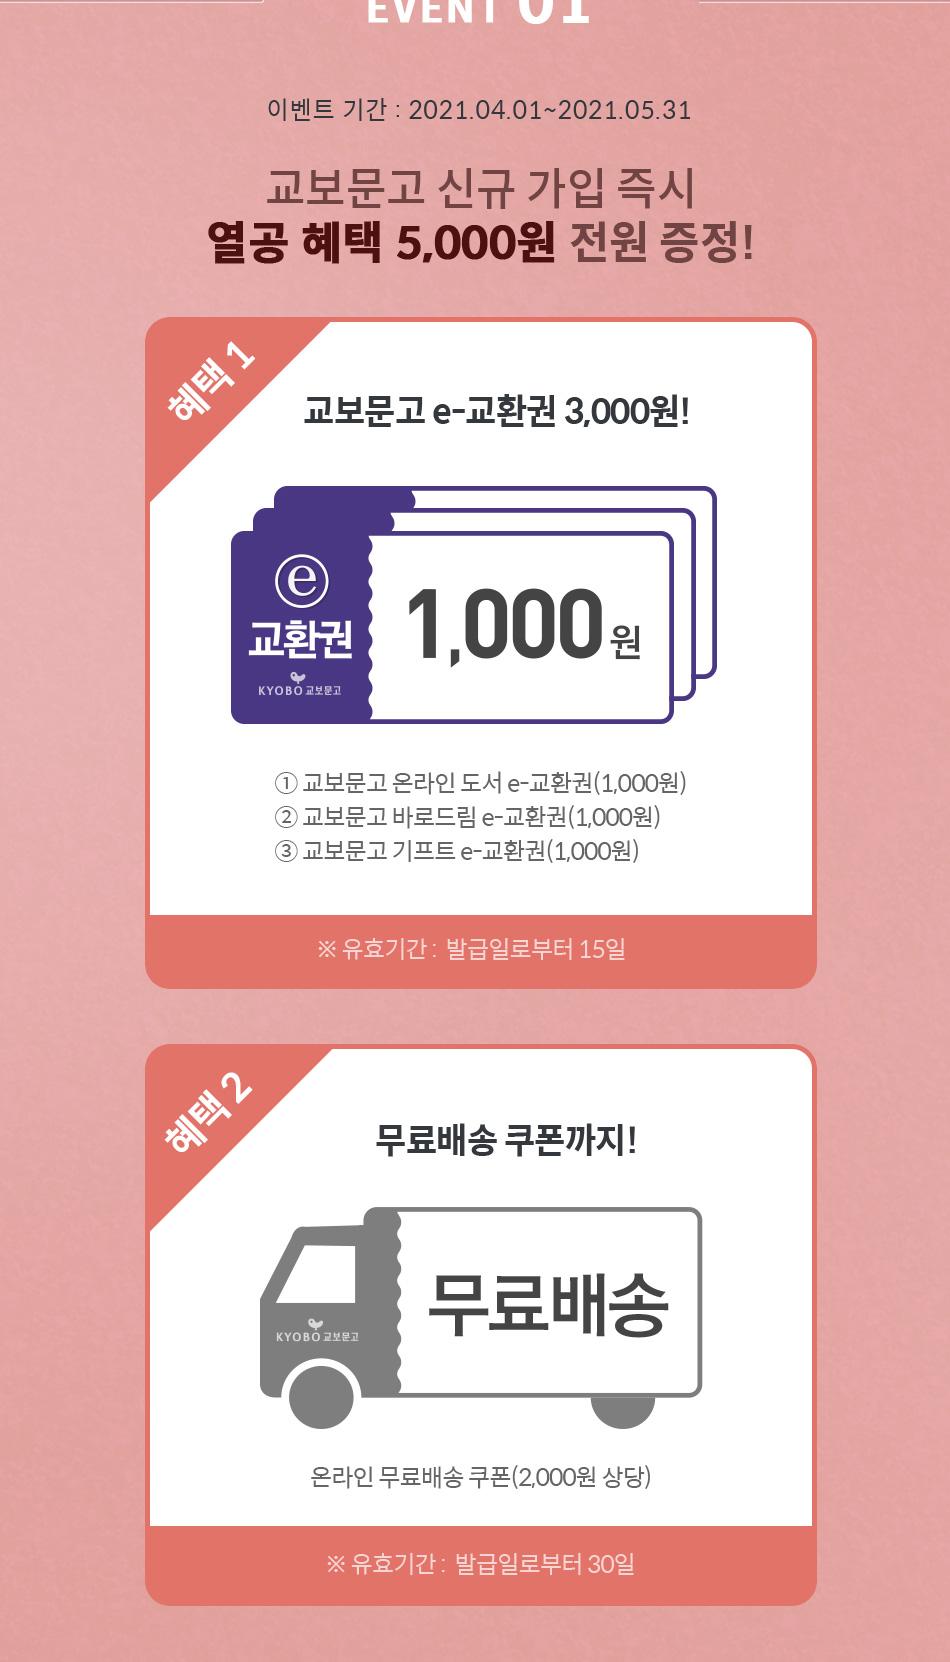 EVENT 01 교보문고 신규 가입 즉시 열공 혜택 5,000원 전원 증정!